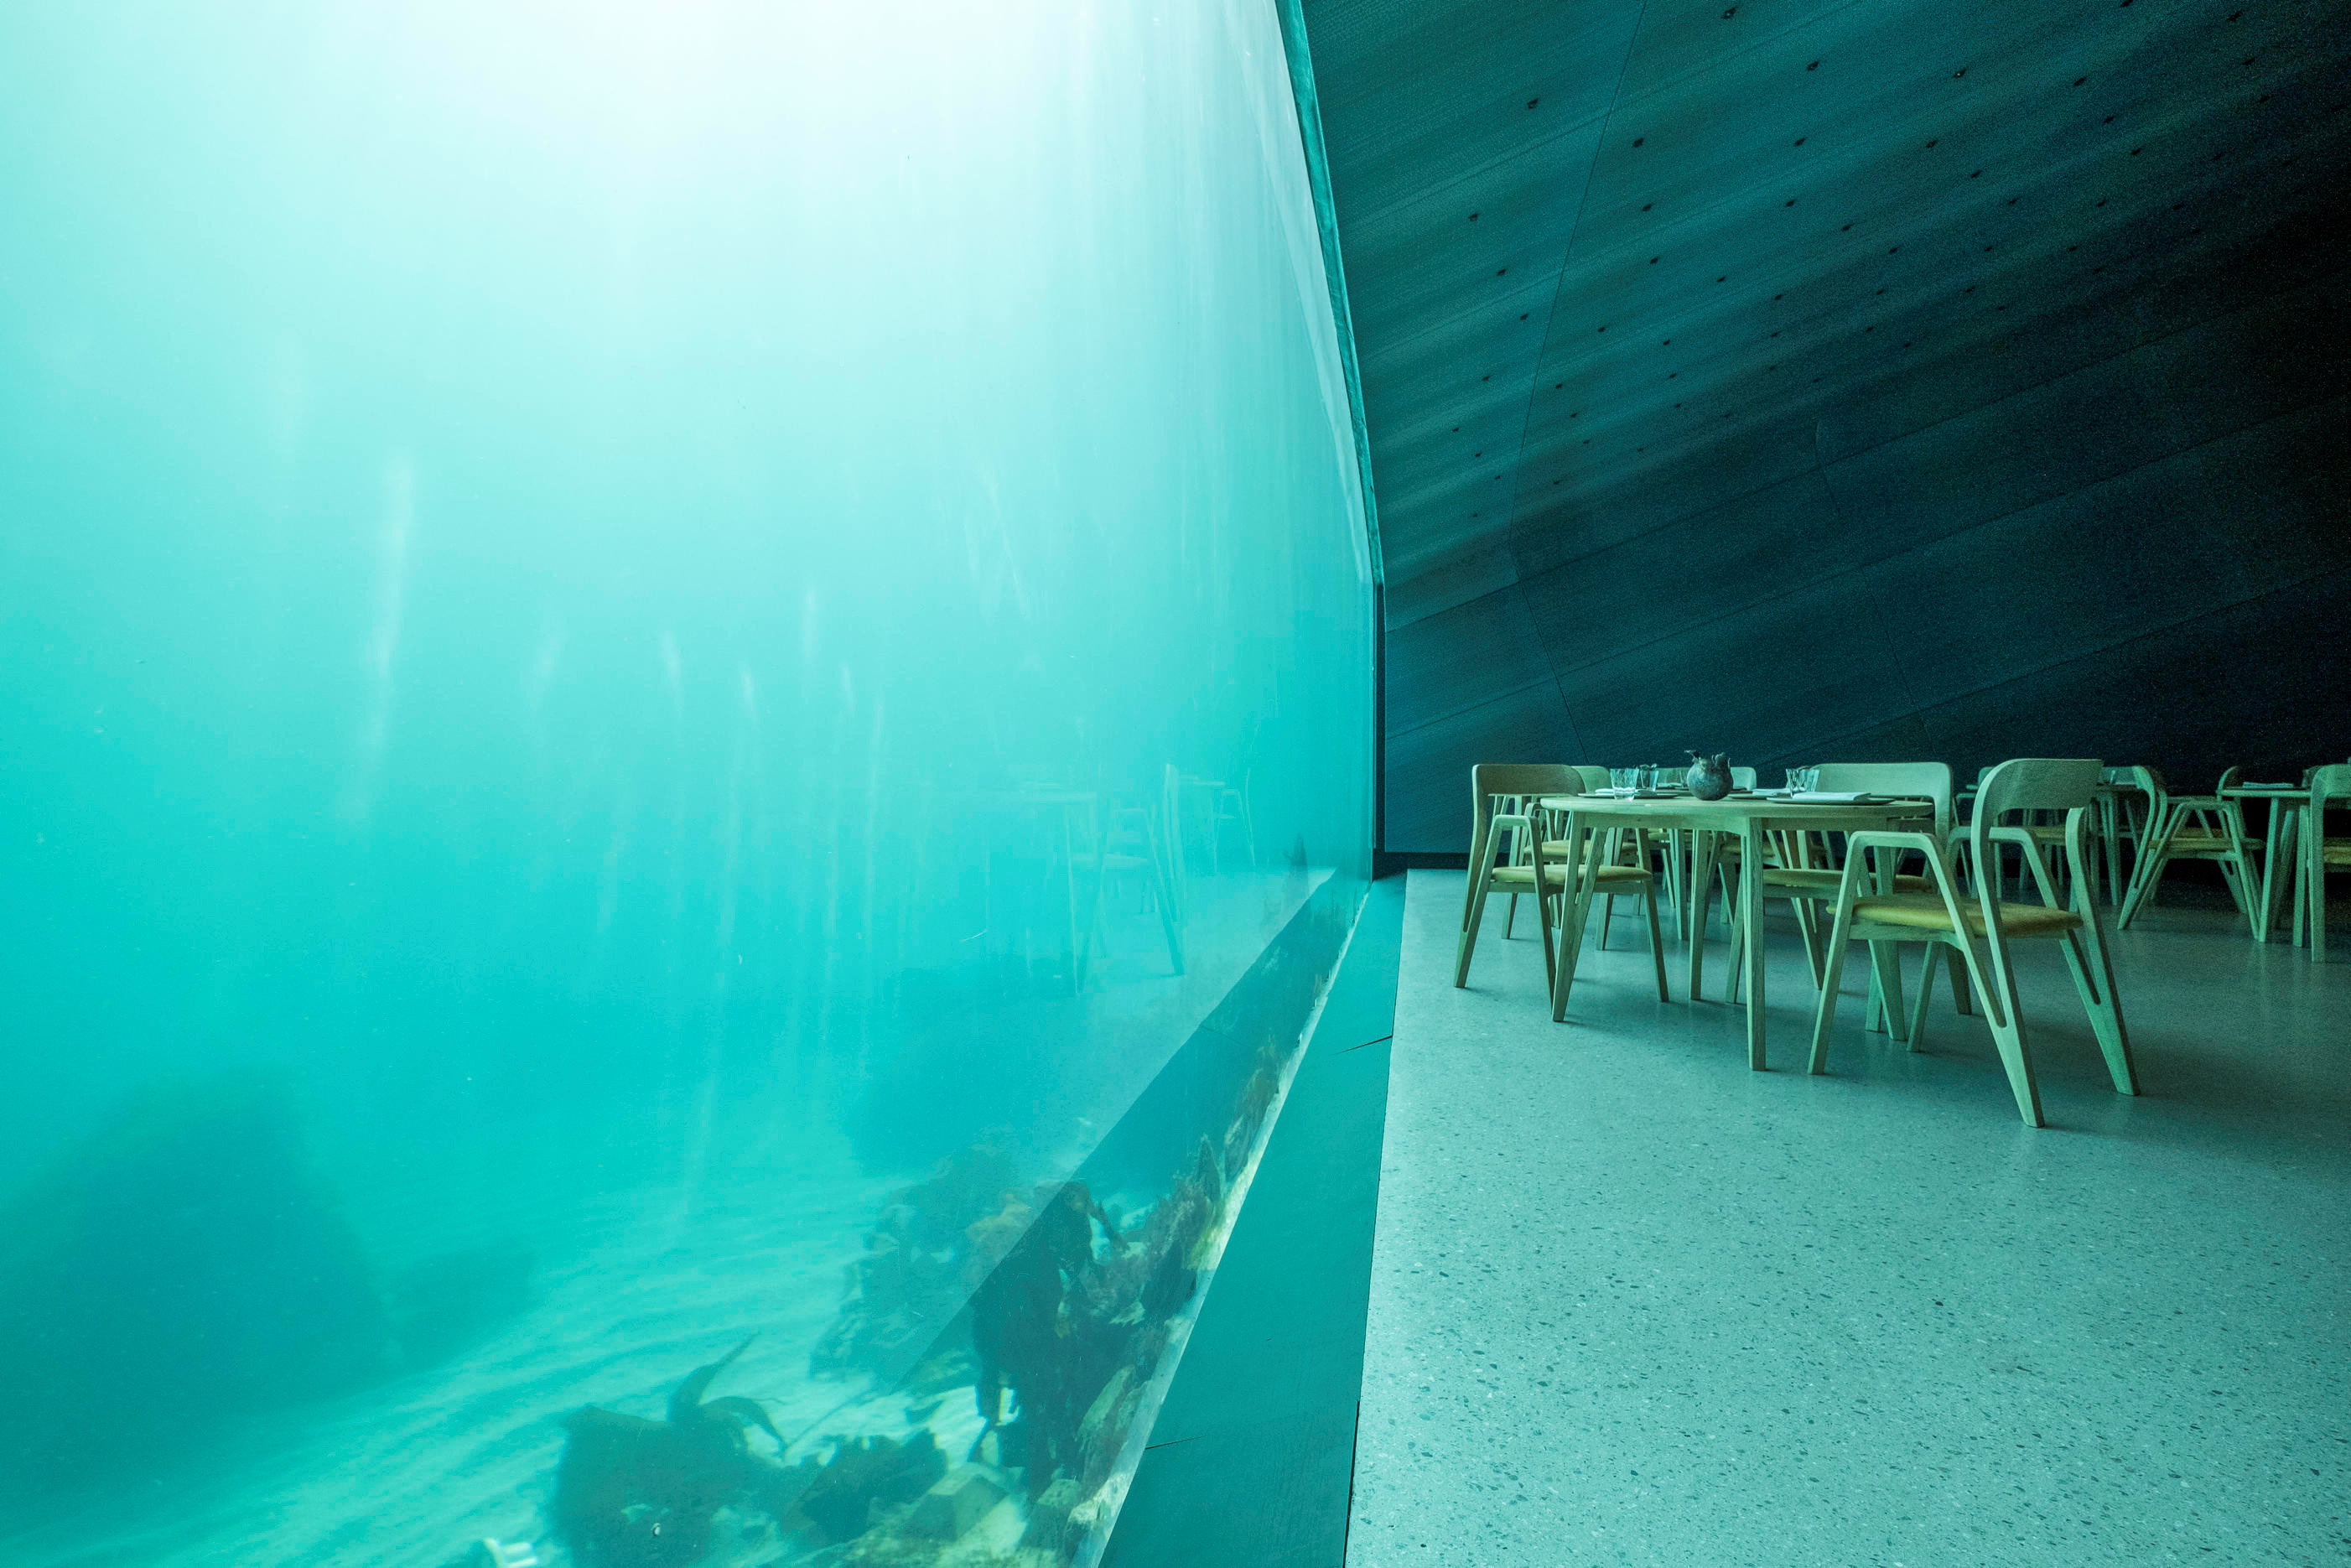 Interiors of